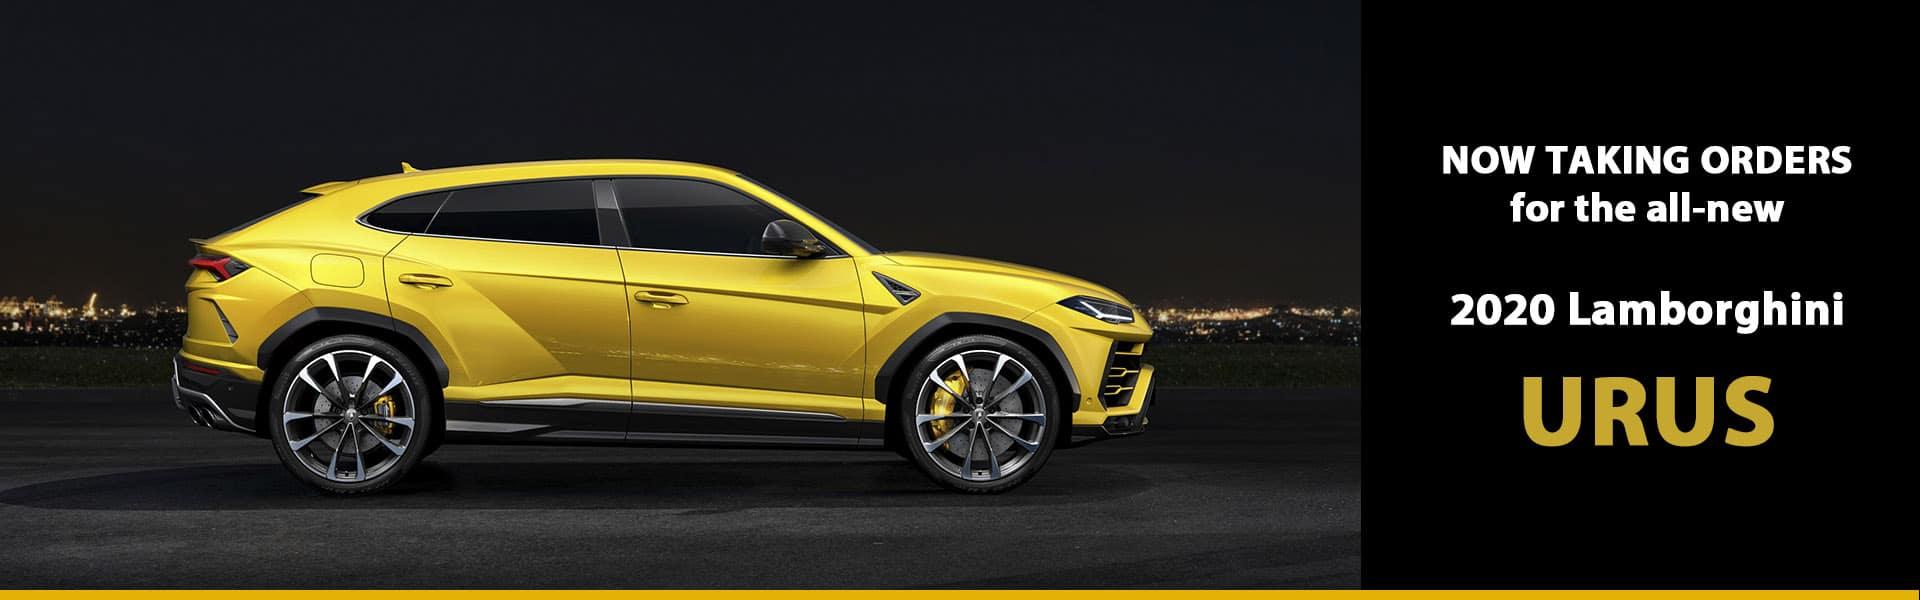 Order Your 2020 Lamborghini Urus SUV Today!